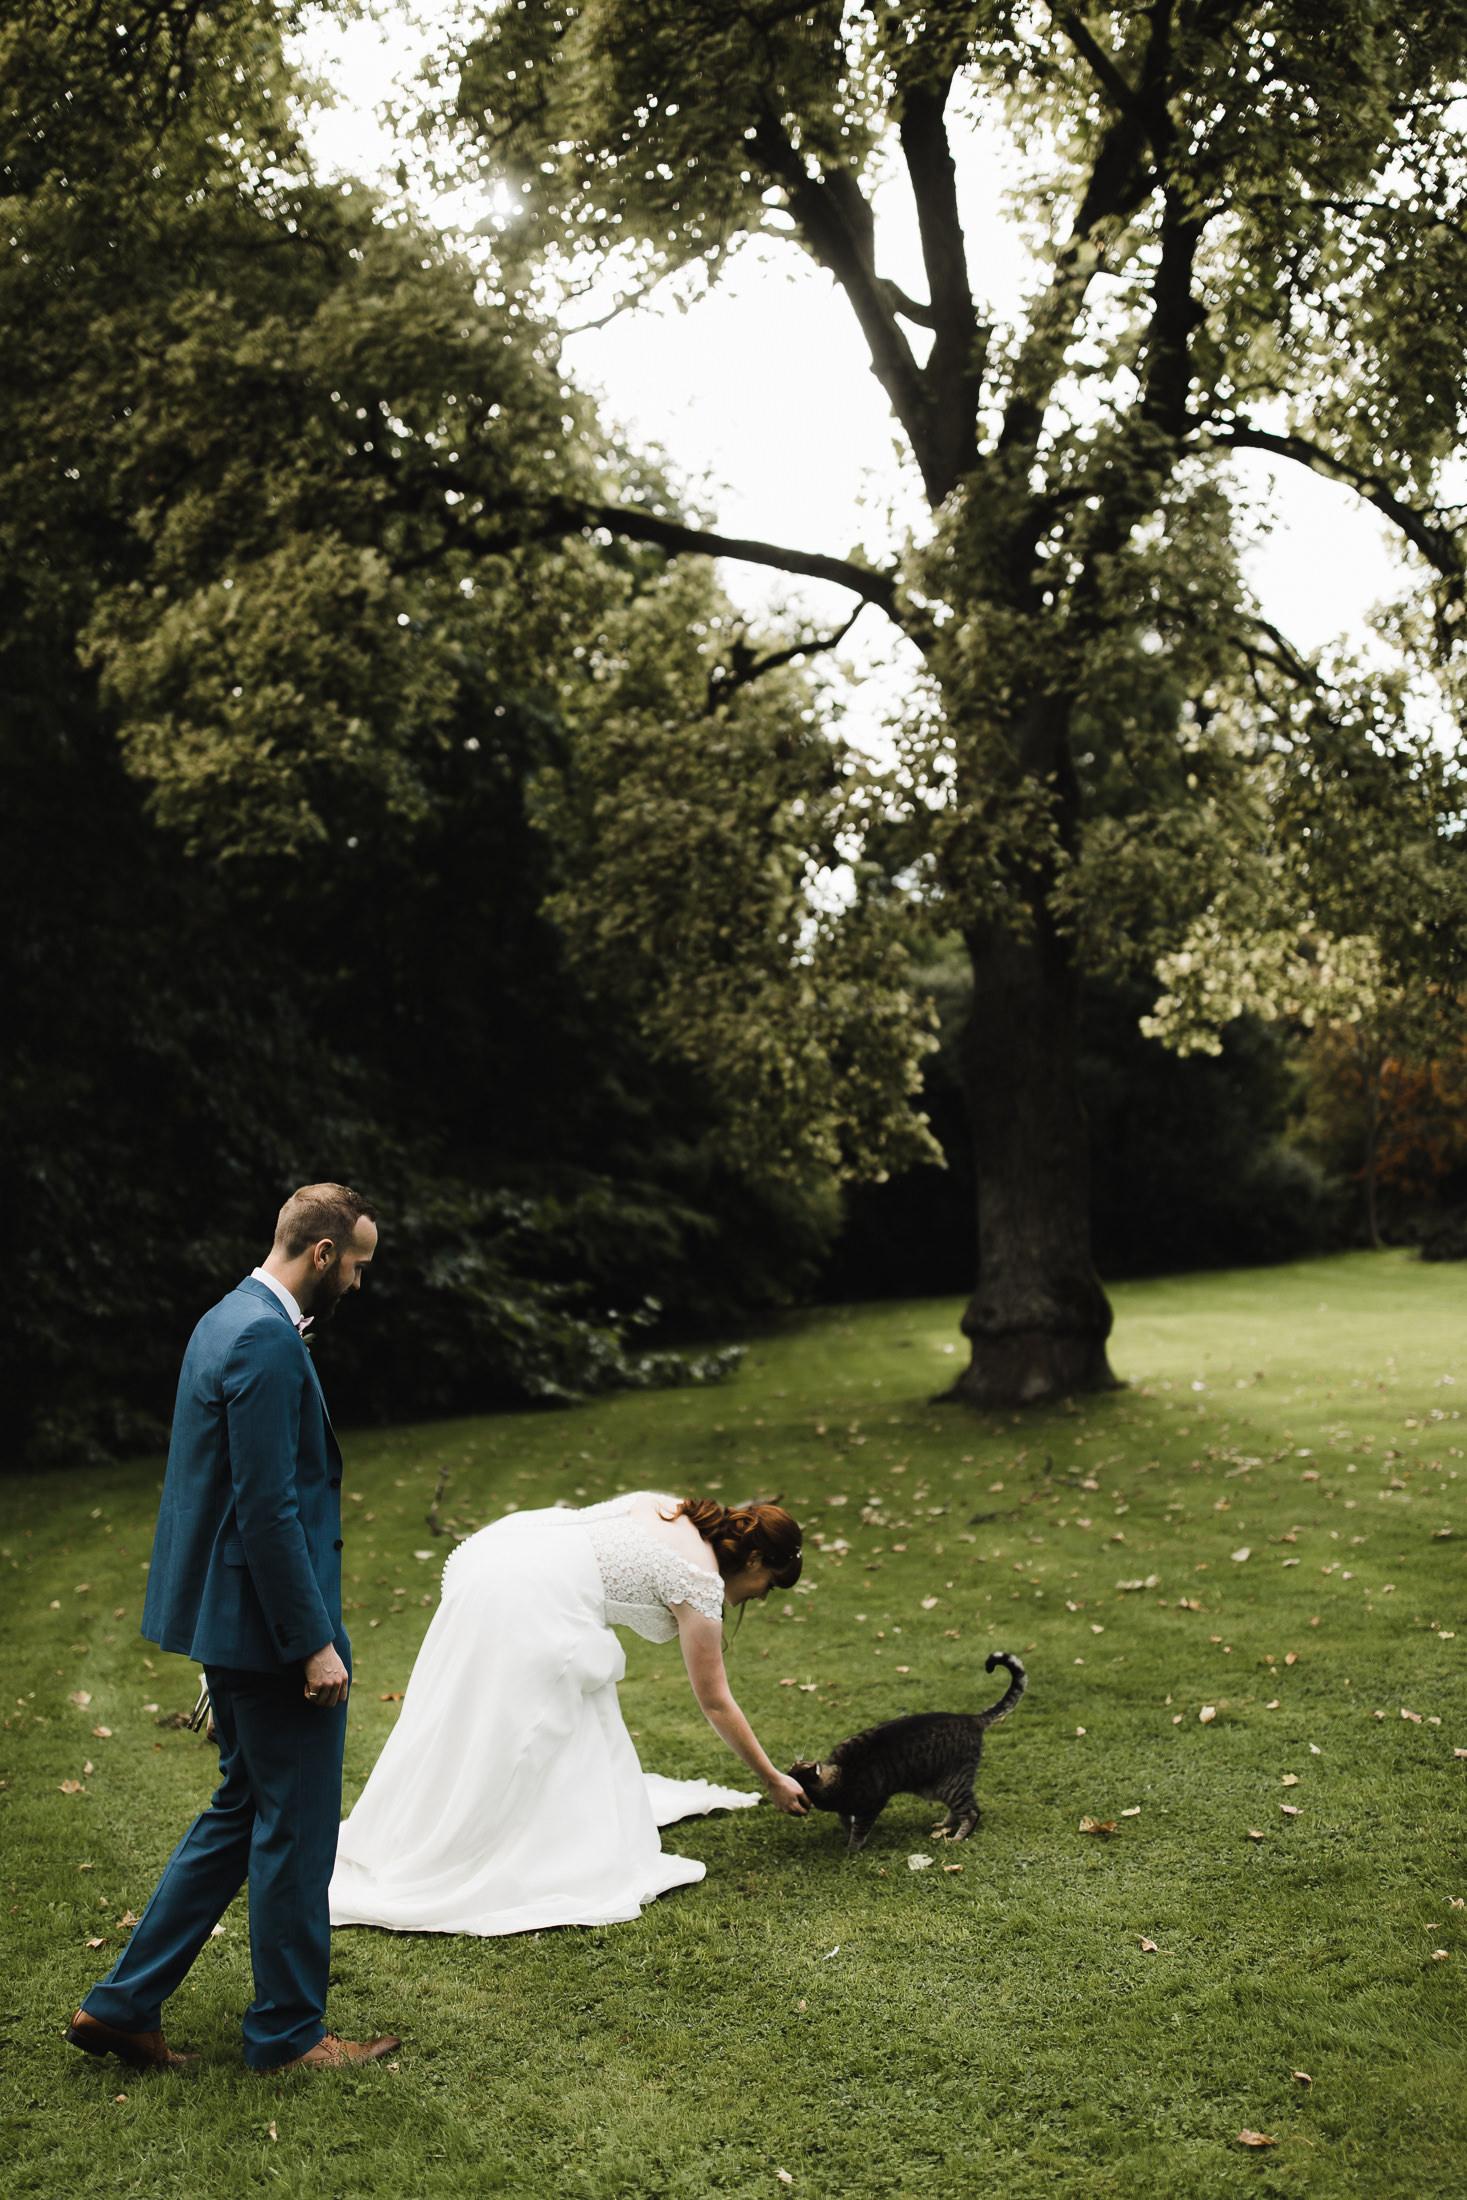 Nether_Wichendon_House_Wedding_060.jpg